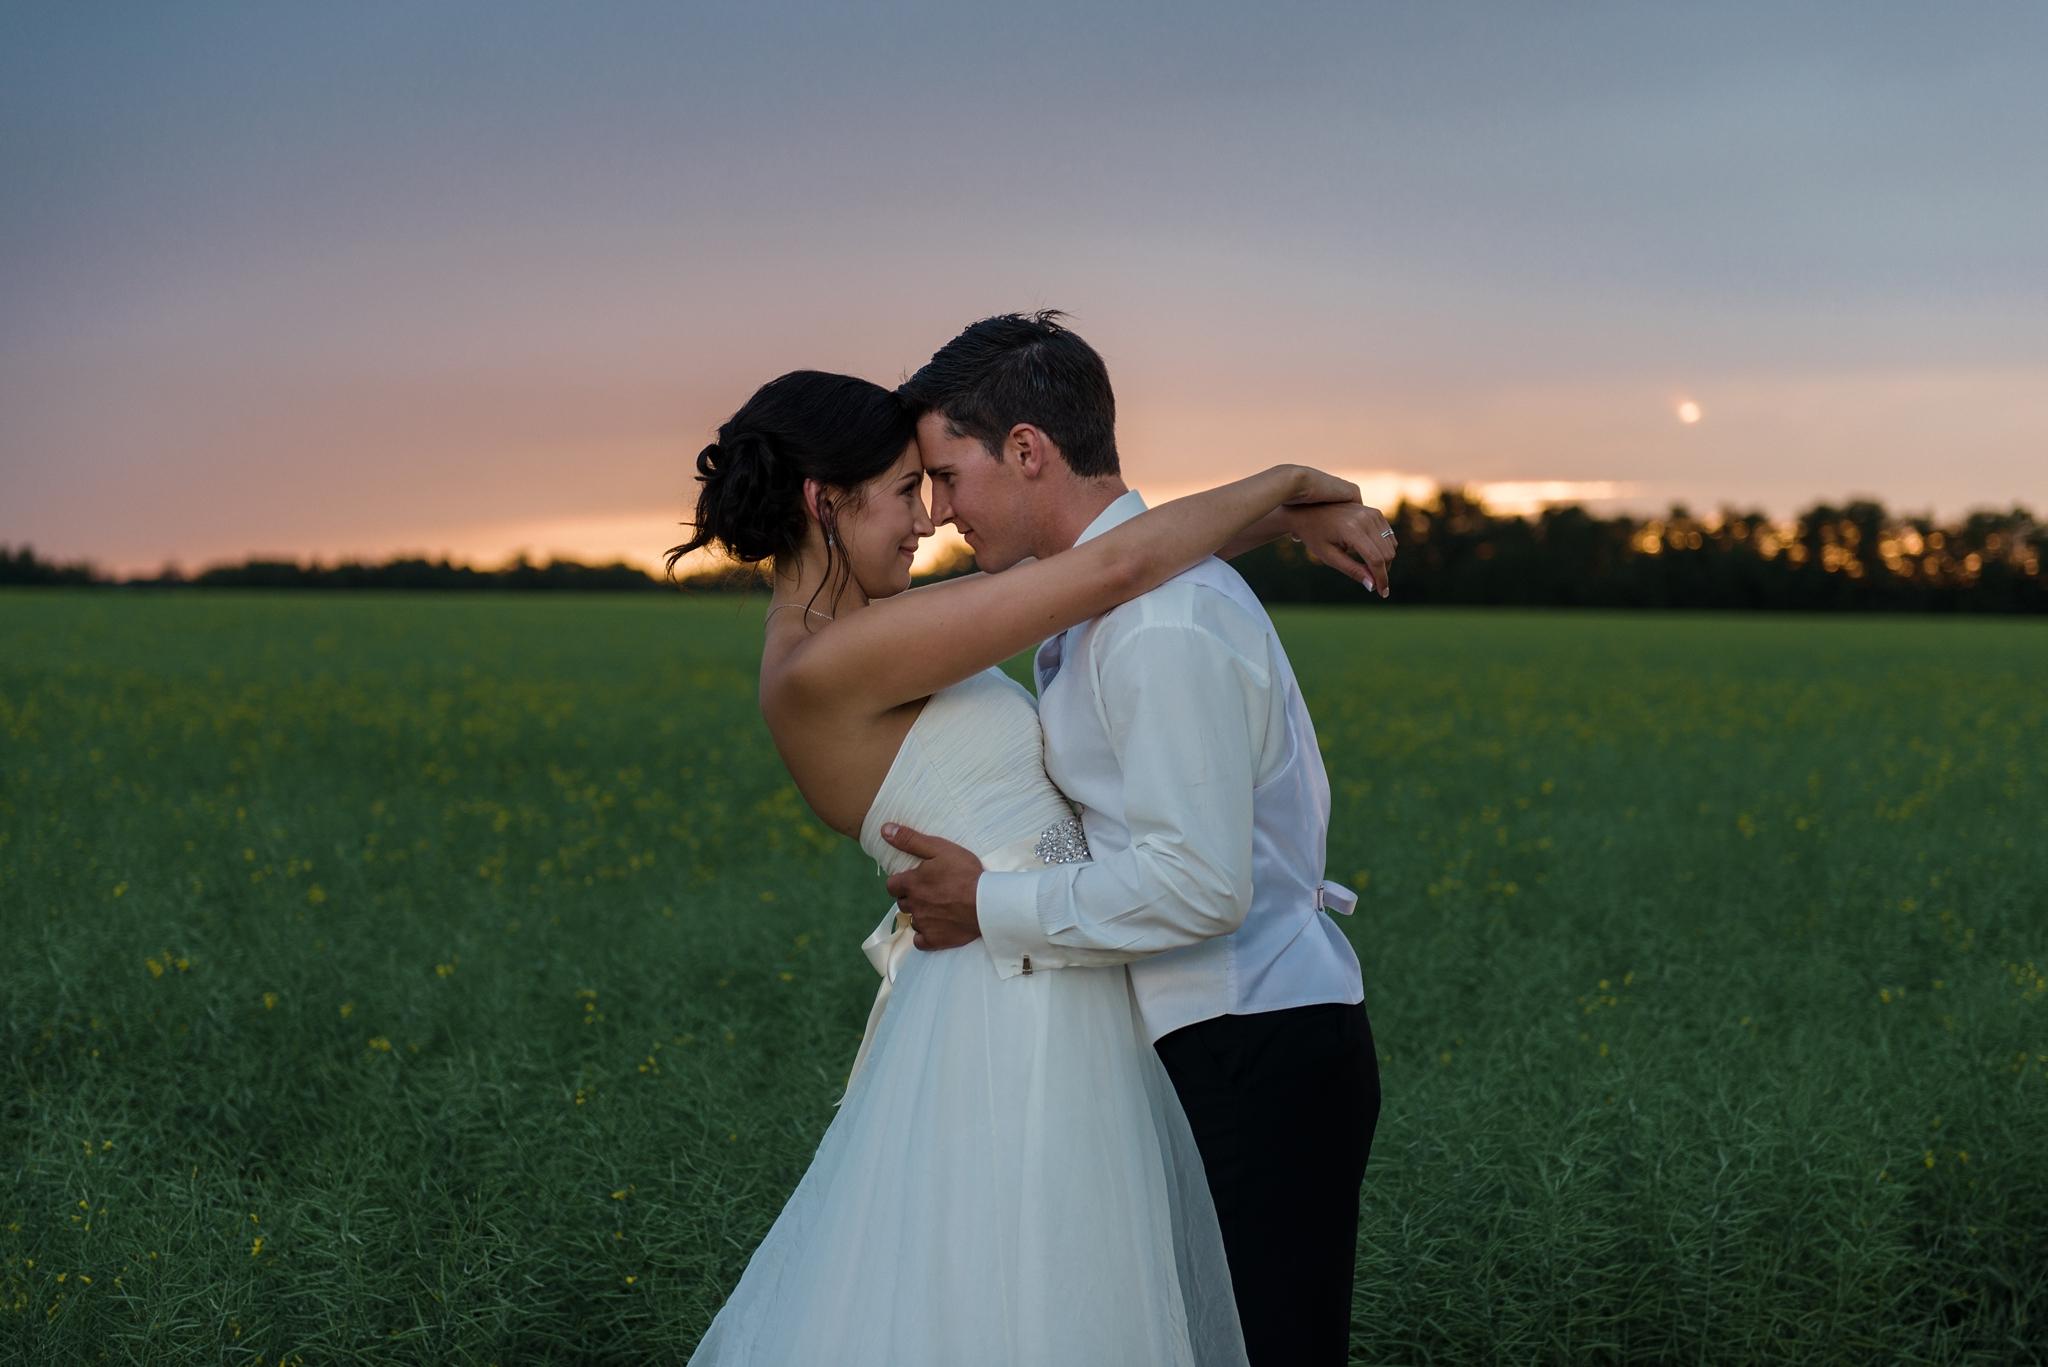 kaihla_tonai_intimate_wedding_elopement_photographer_0117